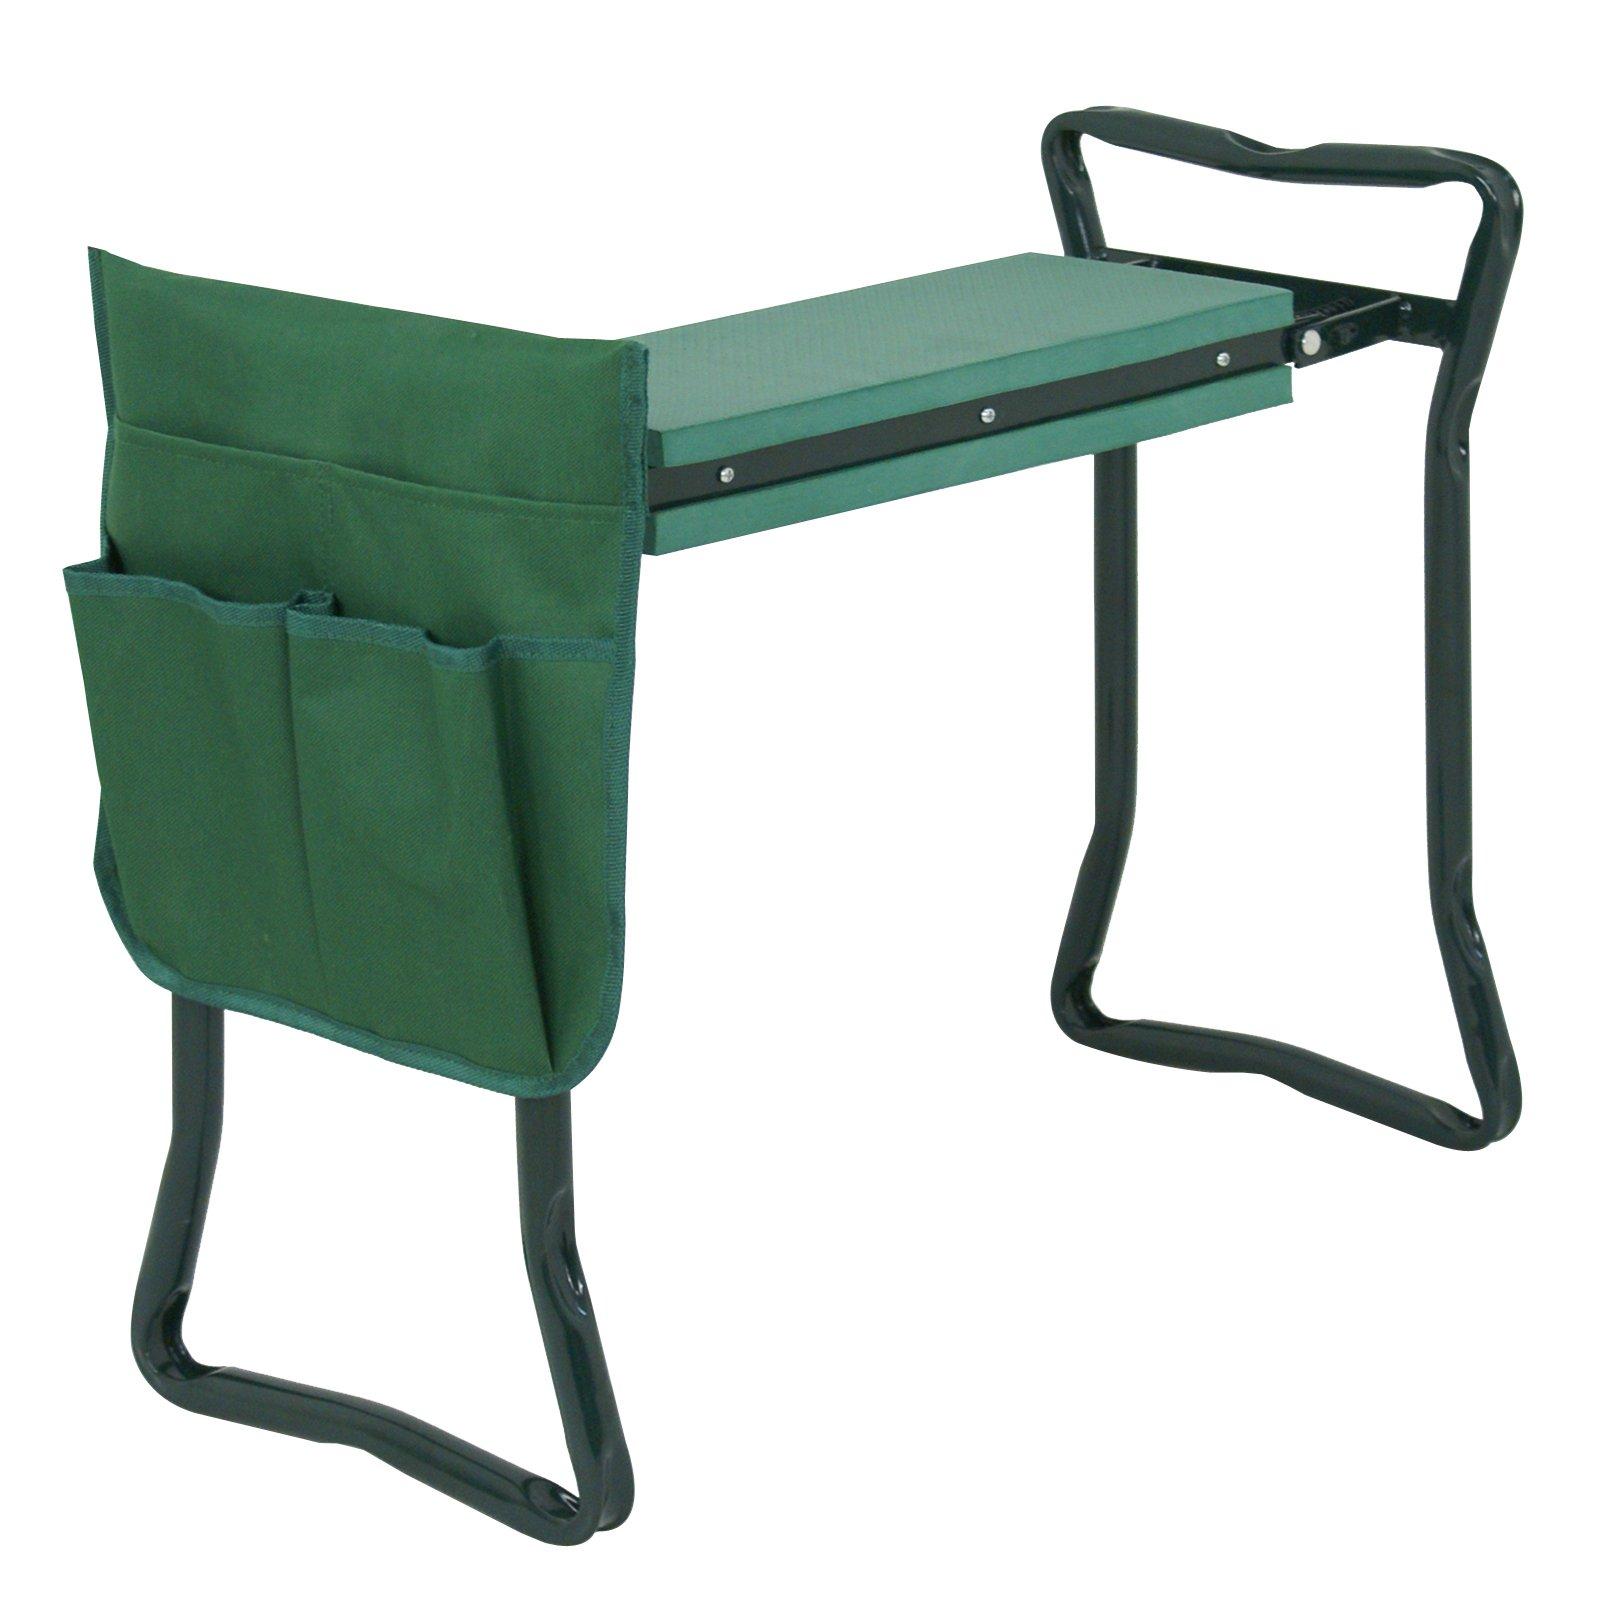 BBBuy Folding Garden Kneeler Bench Stool Gardener Kneeling Seat Portable Tool Pouches with Bonus EVA Foam Pad